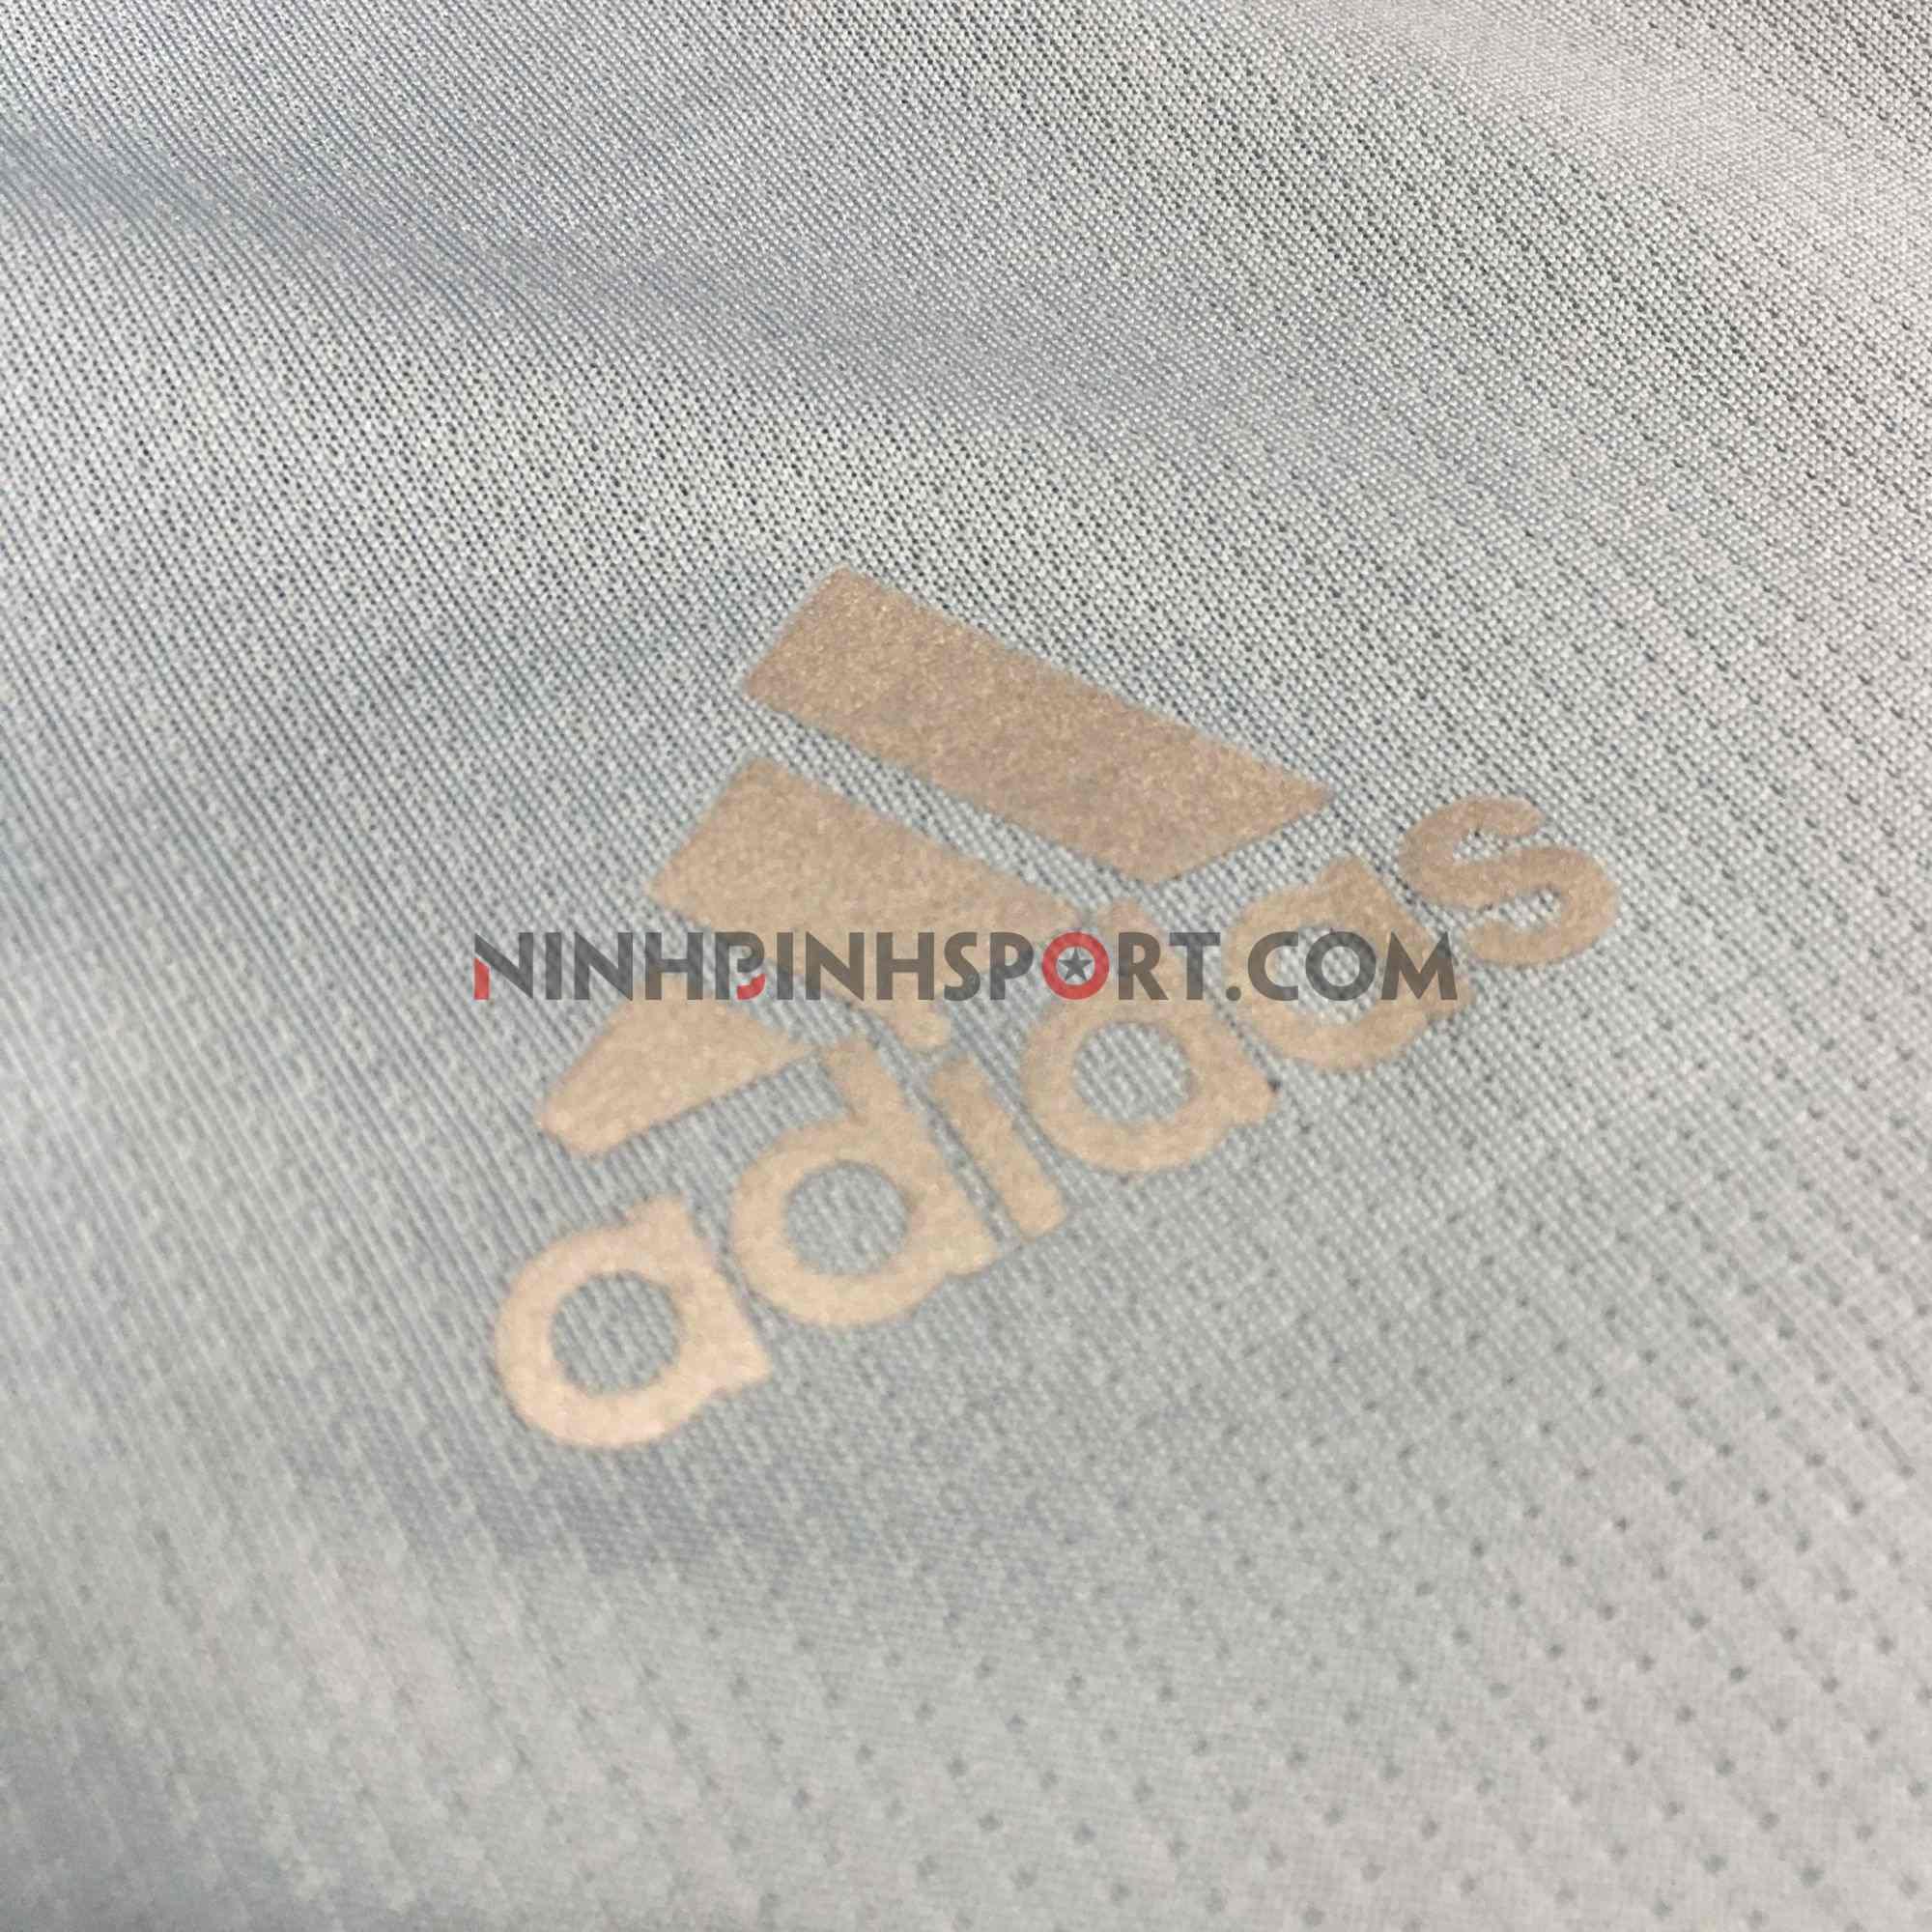 Áo thể thao nam Adidas Own the Run Tee - Blue DX1317